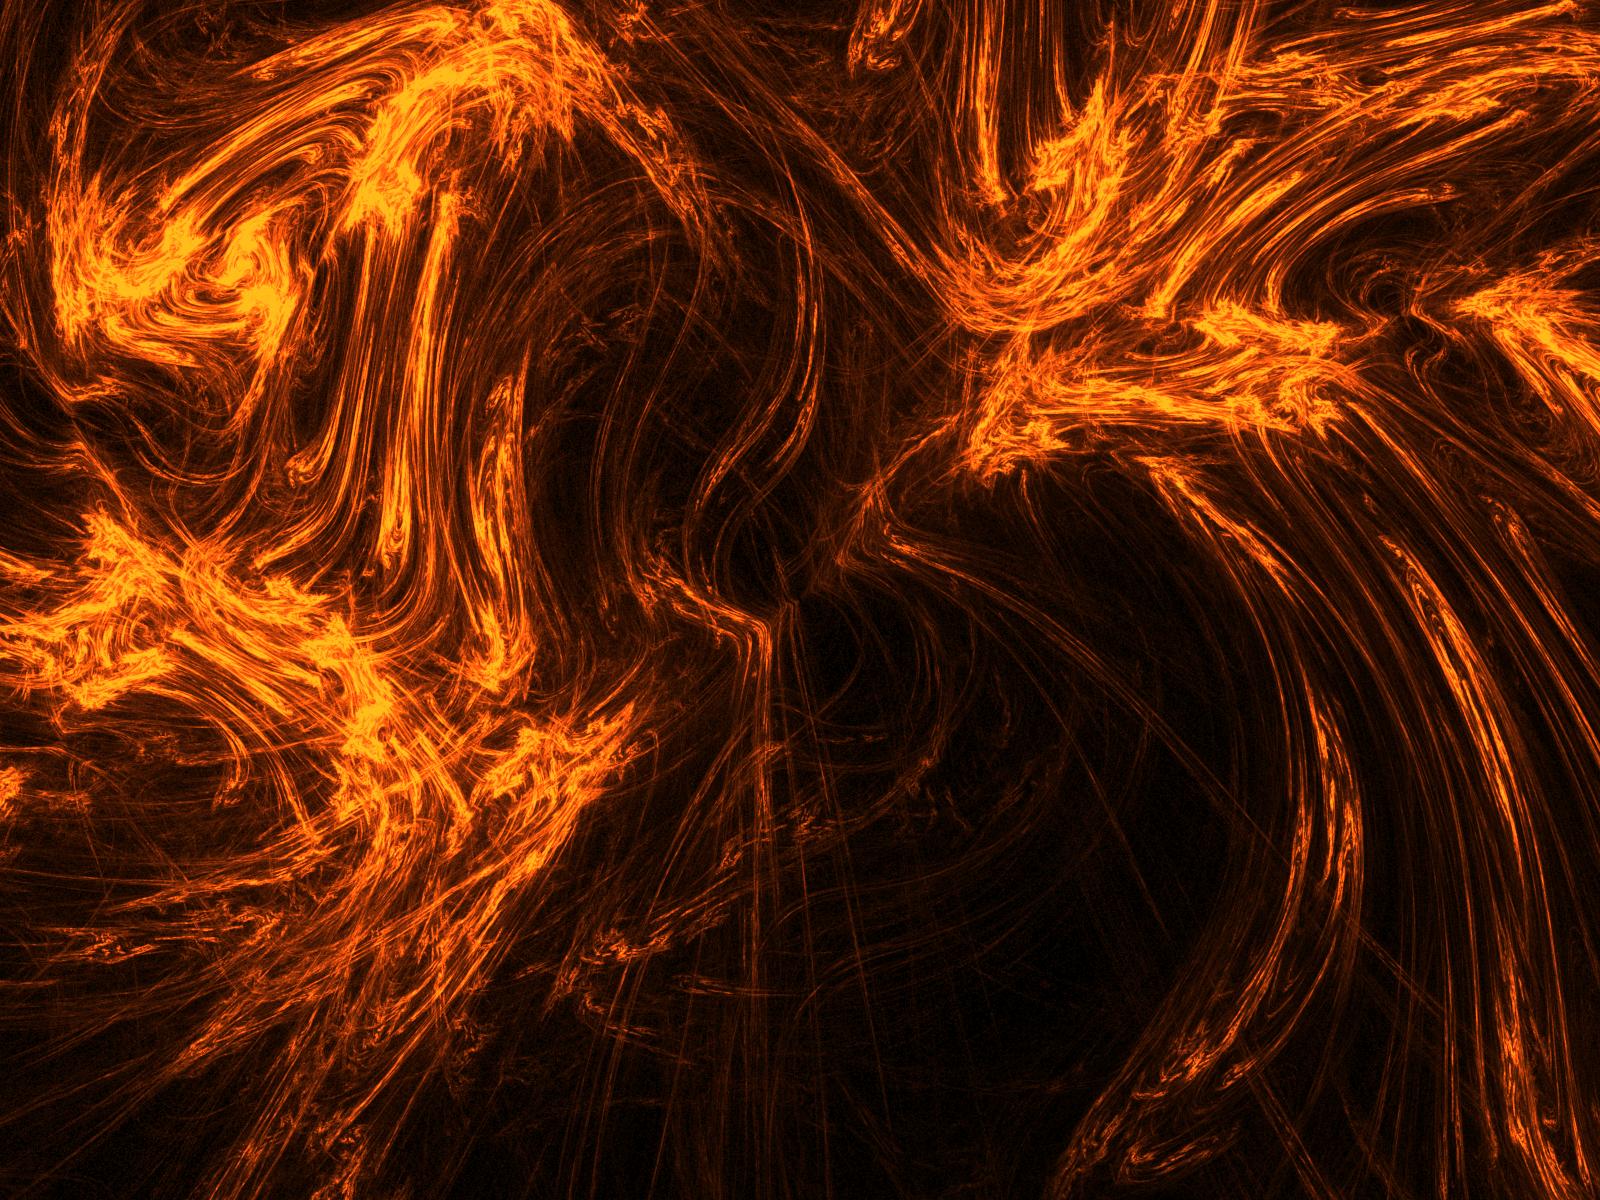 1600x1200 > Hellfire Wallpapers